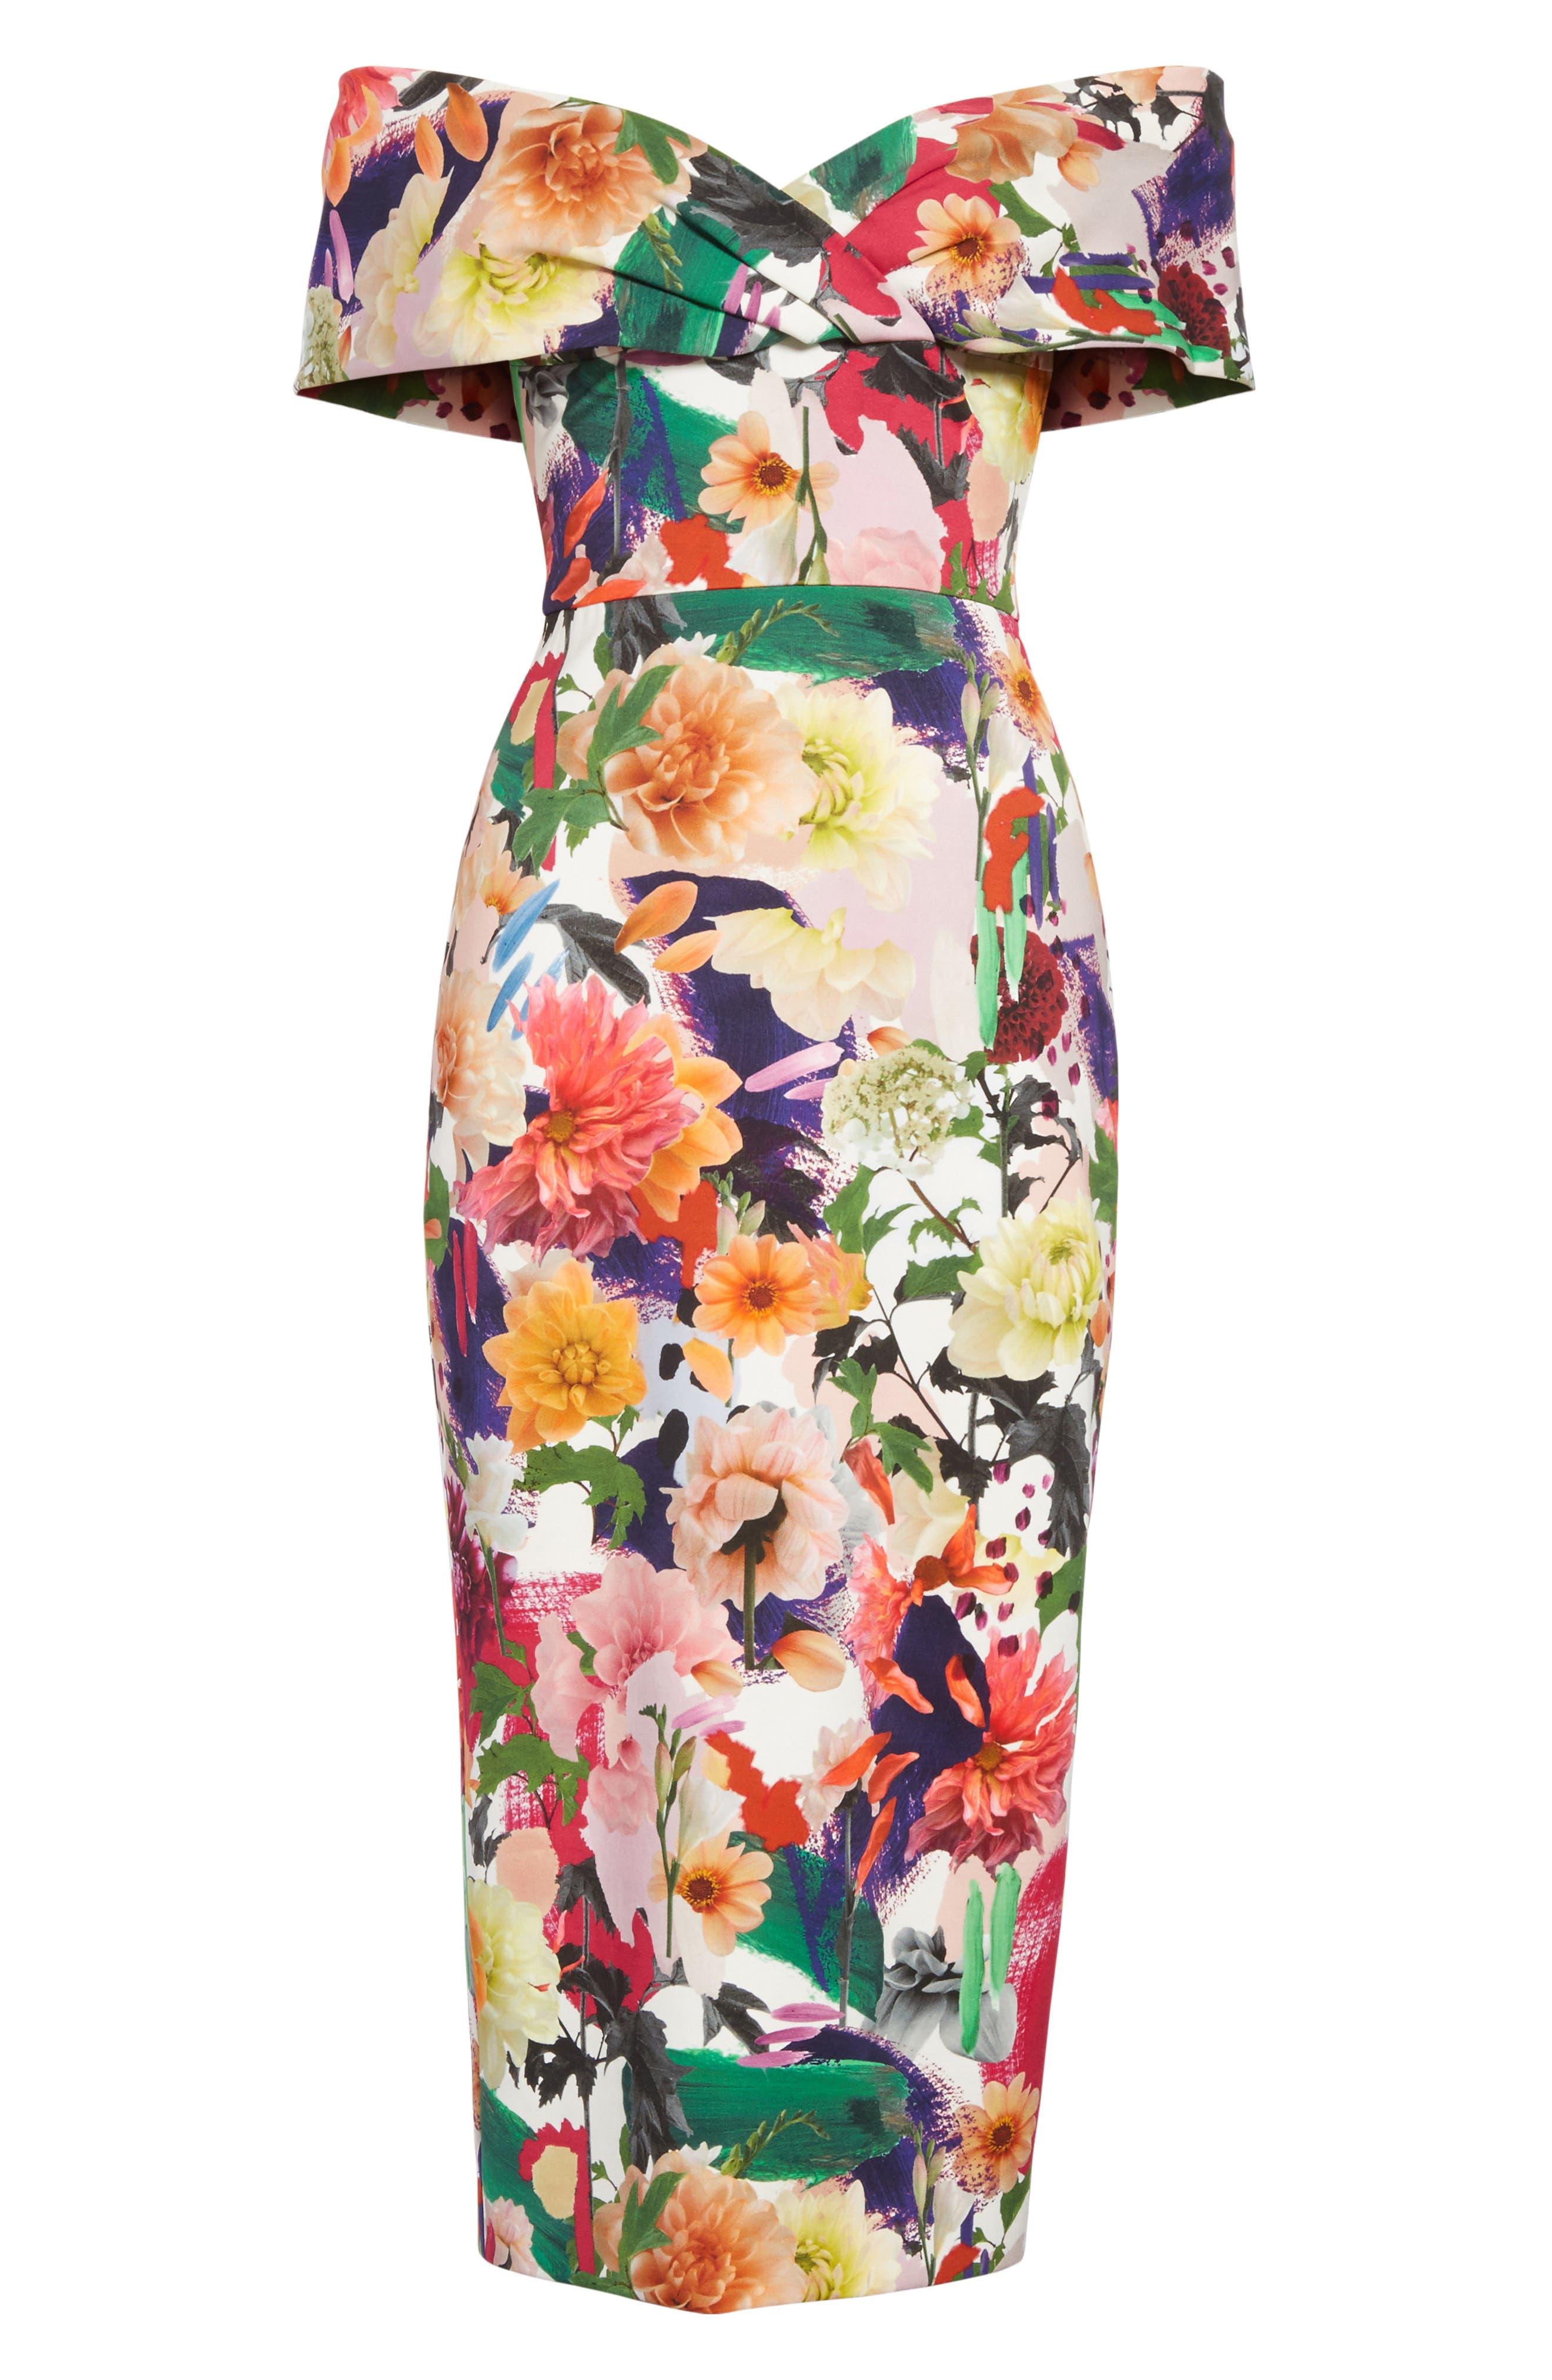 Floral Print Off the Shoulder Sheath Dress,                             Alternate thumbnail 6, color,                             191